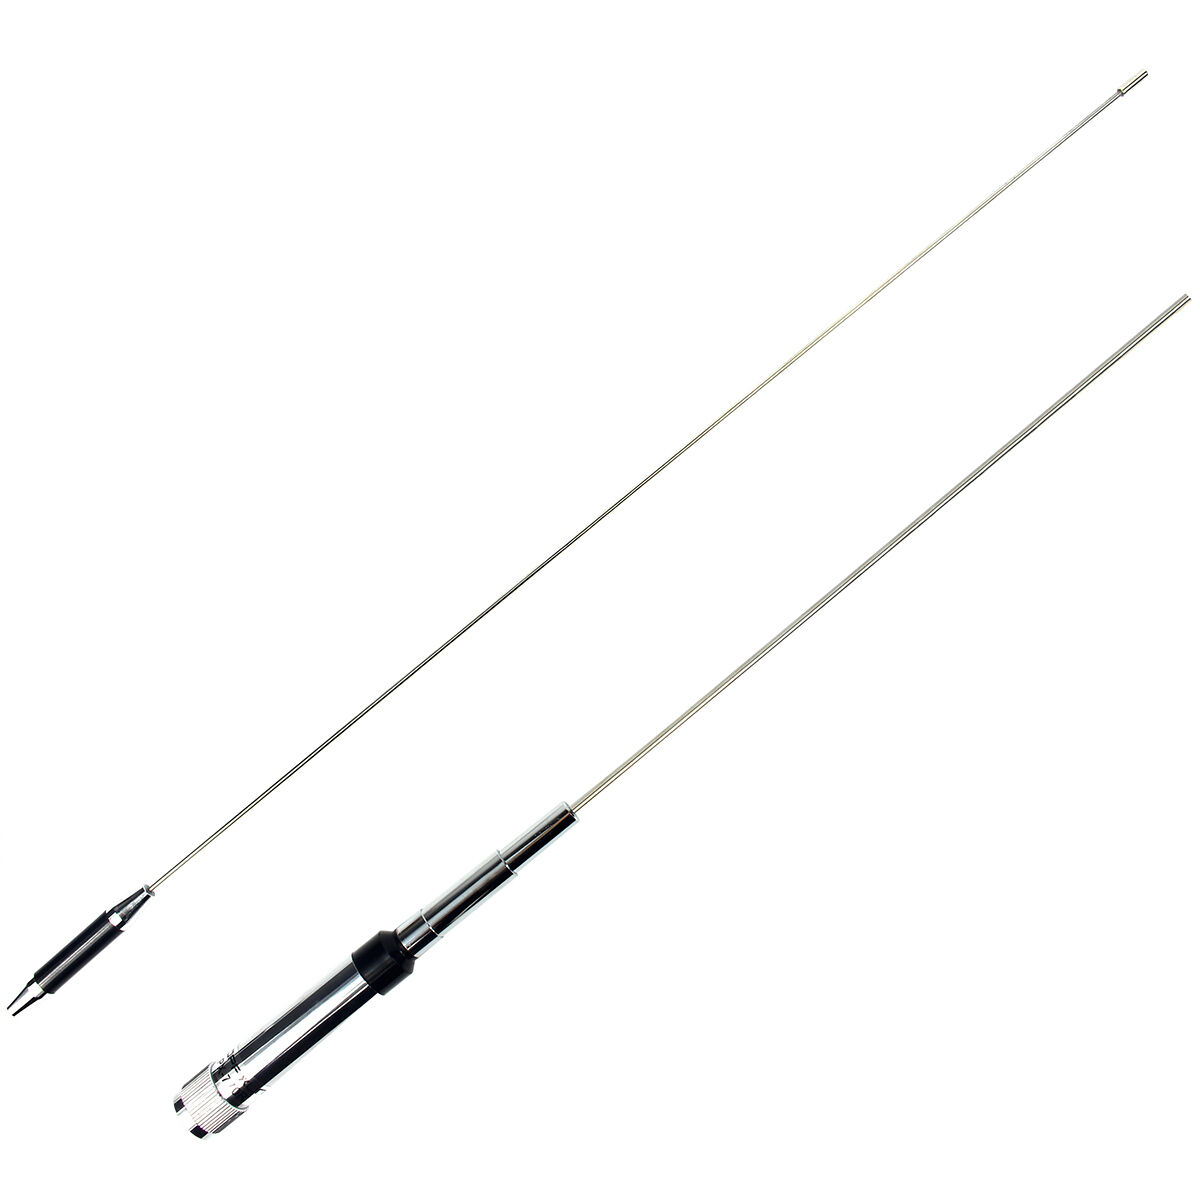 Amateur vhf antenna — pic 10